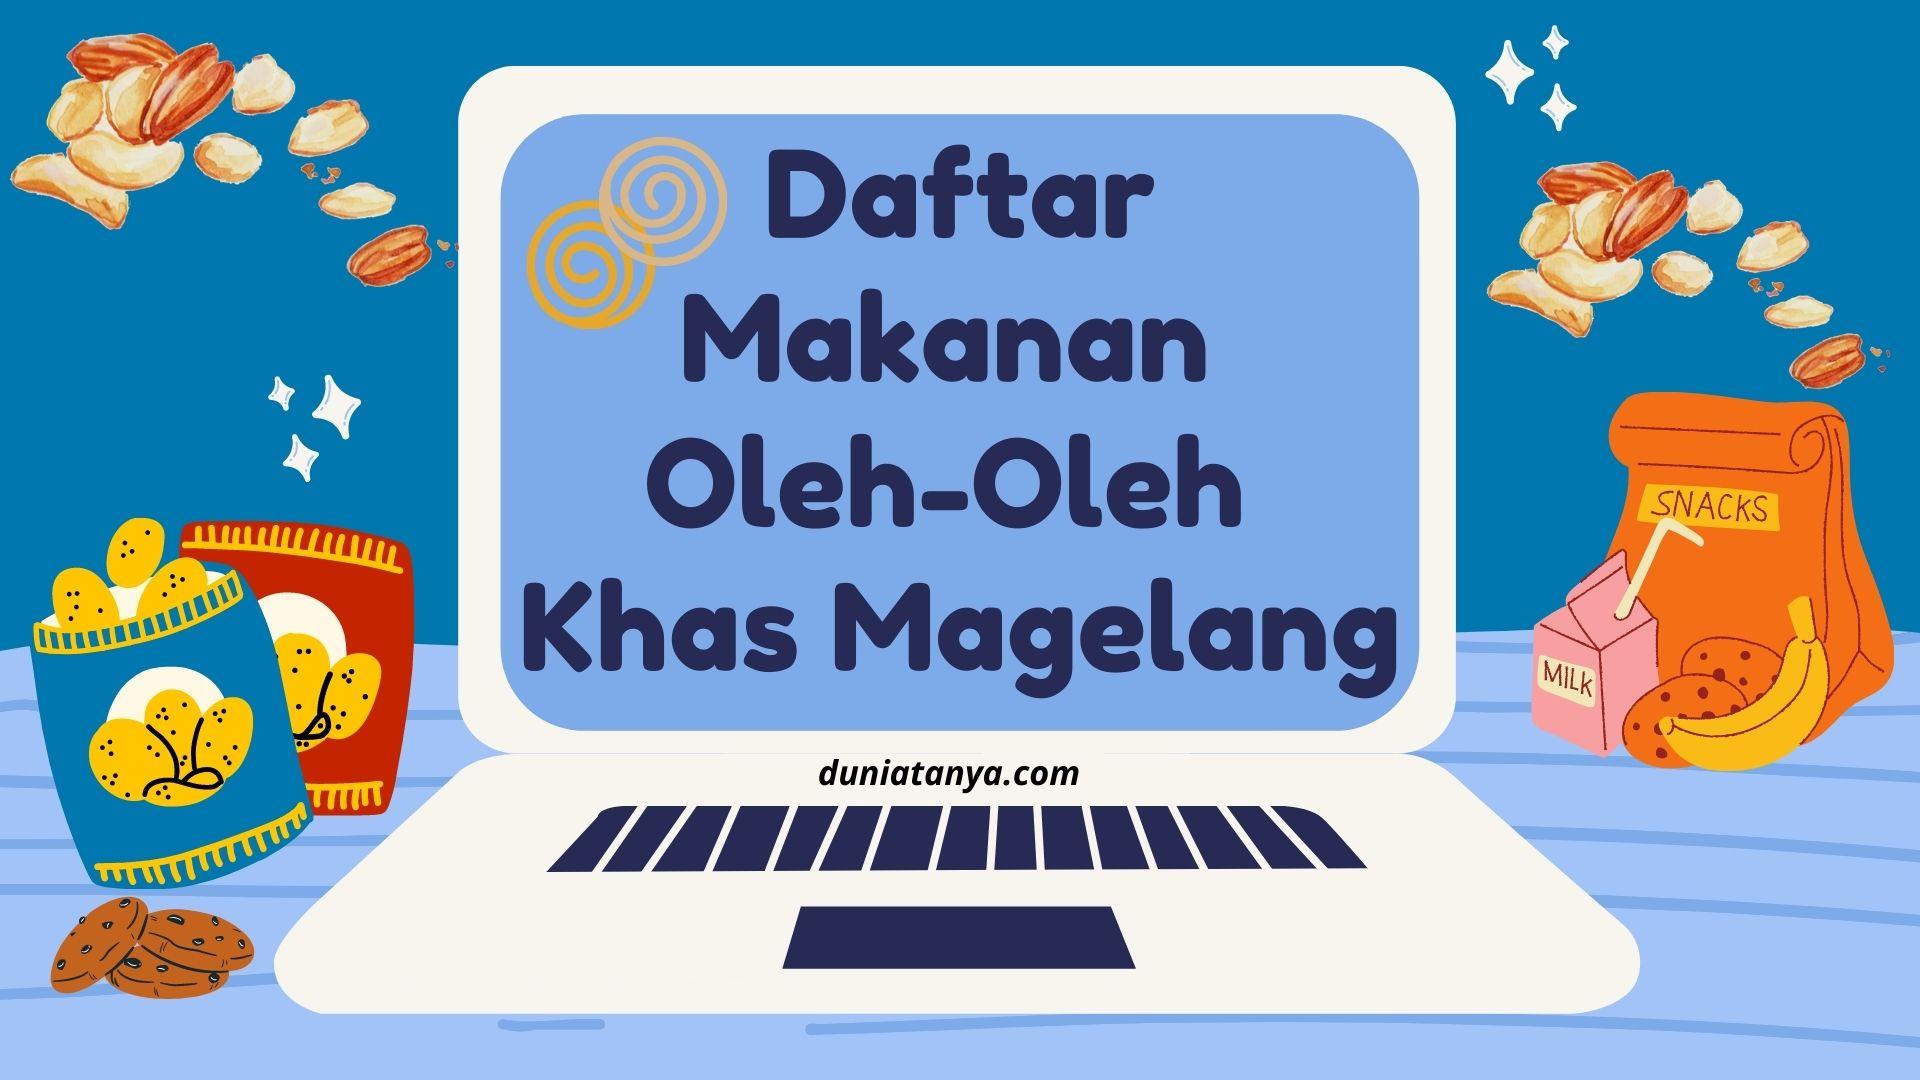 You are currently viewing Daftar Makanan Oleh-Oleh Khas Magelang